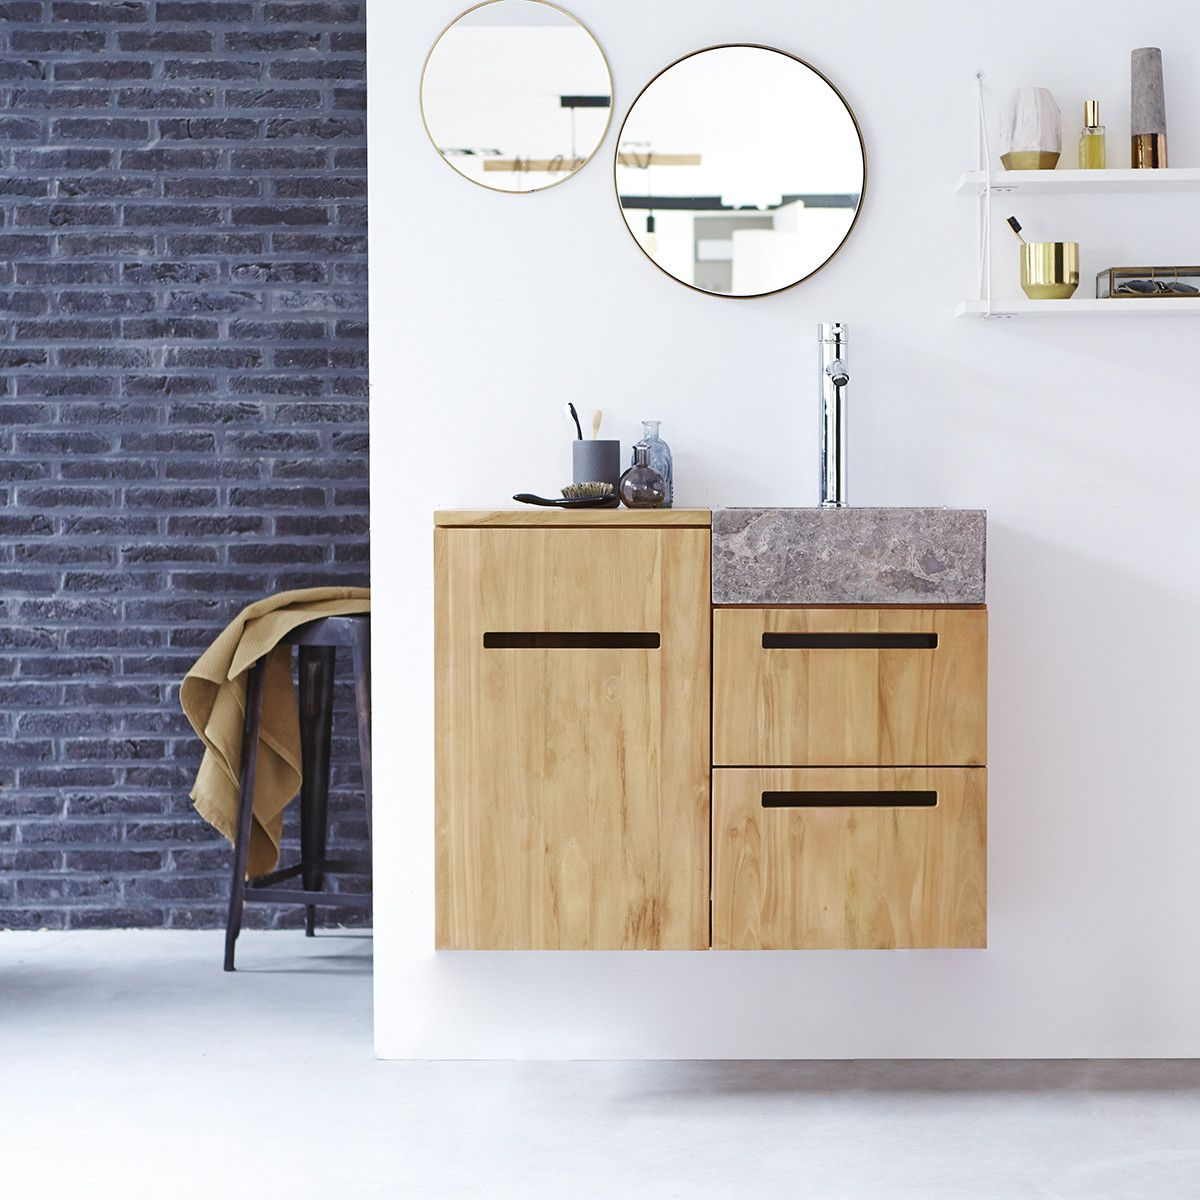 Line Teak And Marble Wash Unit 85 In 2020 Teak Bathroom Simple Bathroom Classic Bathroom Furniture